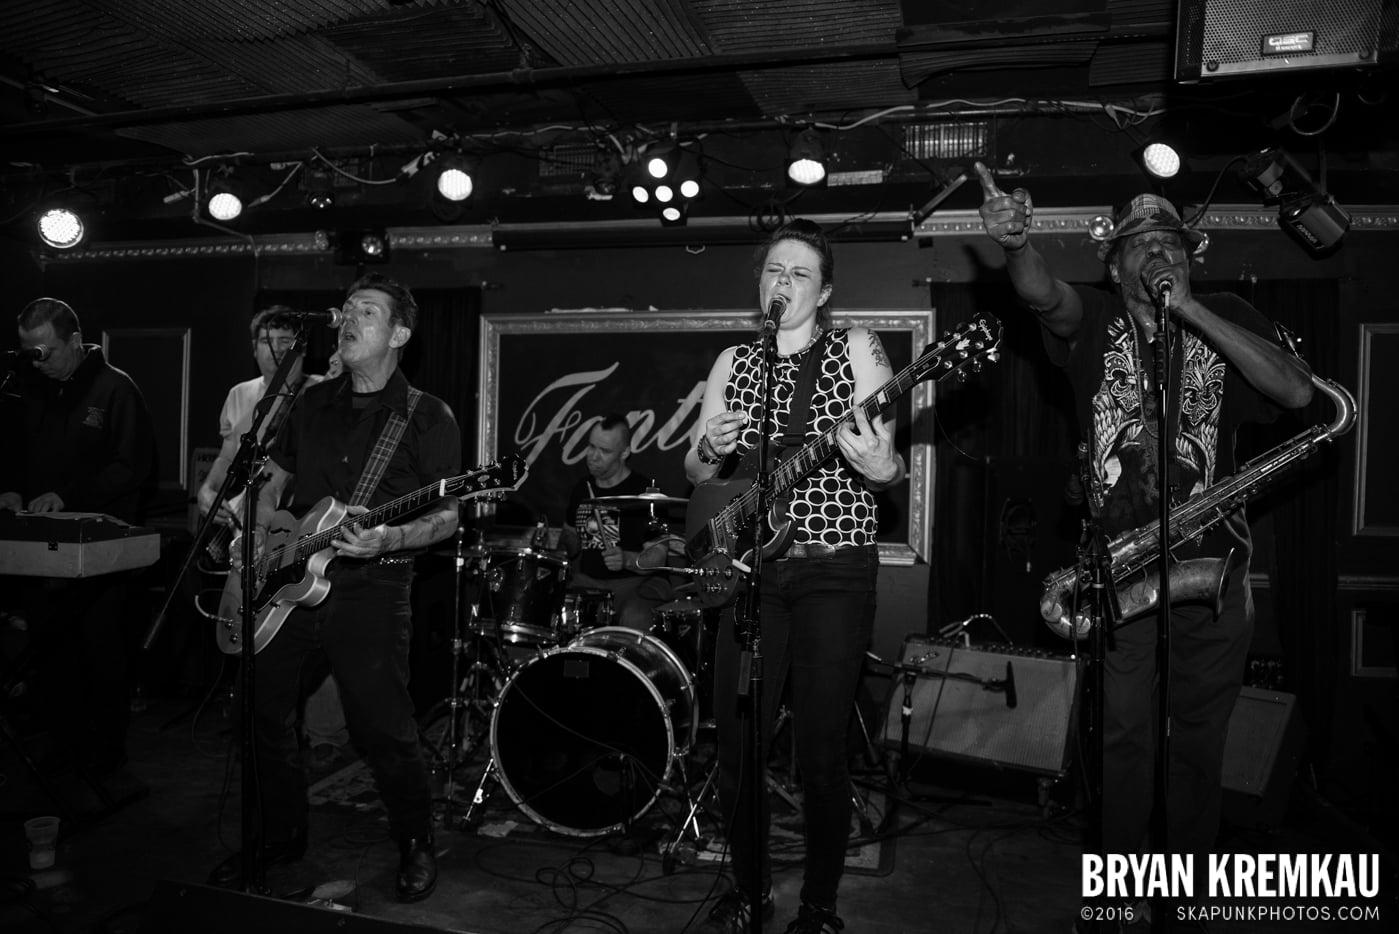 Roddy Radiation & The Scotch Bonnets @ Fontana's, NYC - 4.25.15 (8)